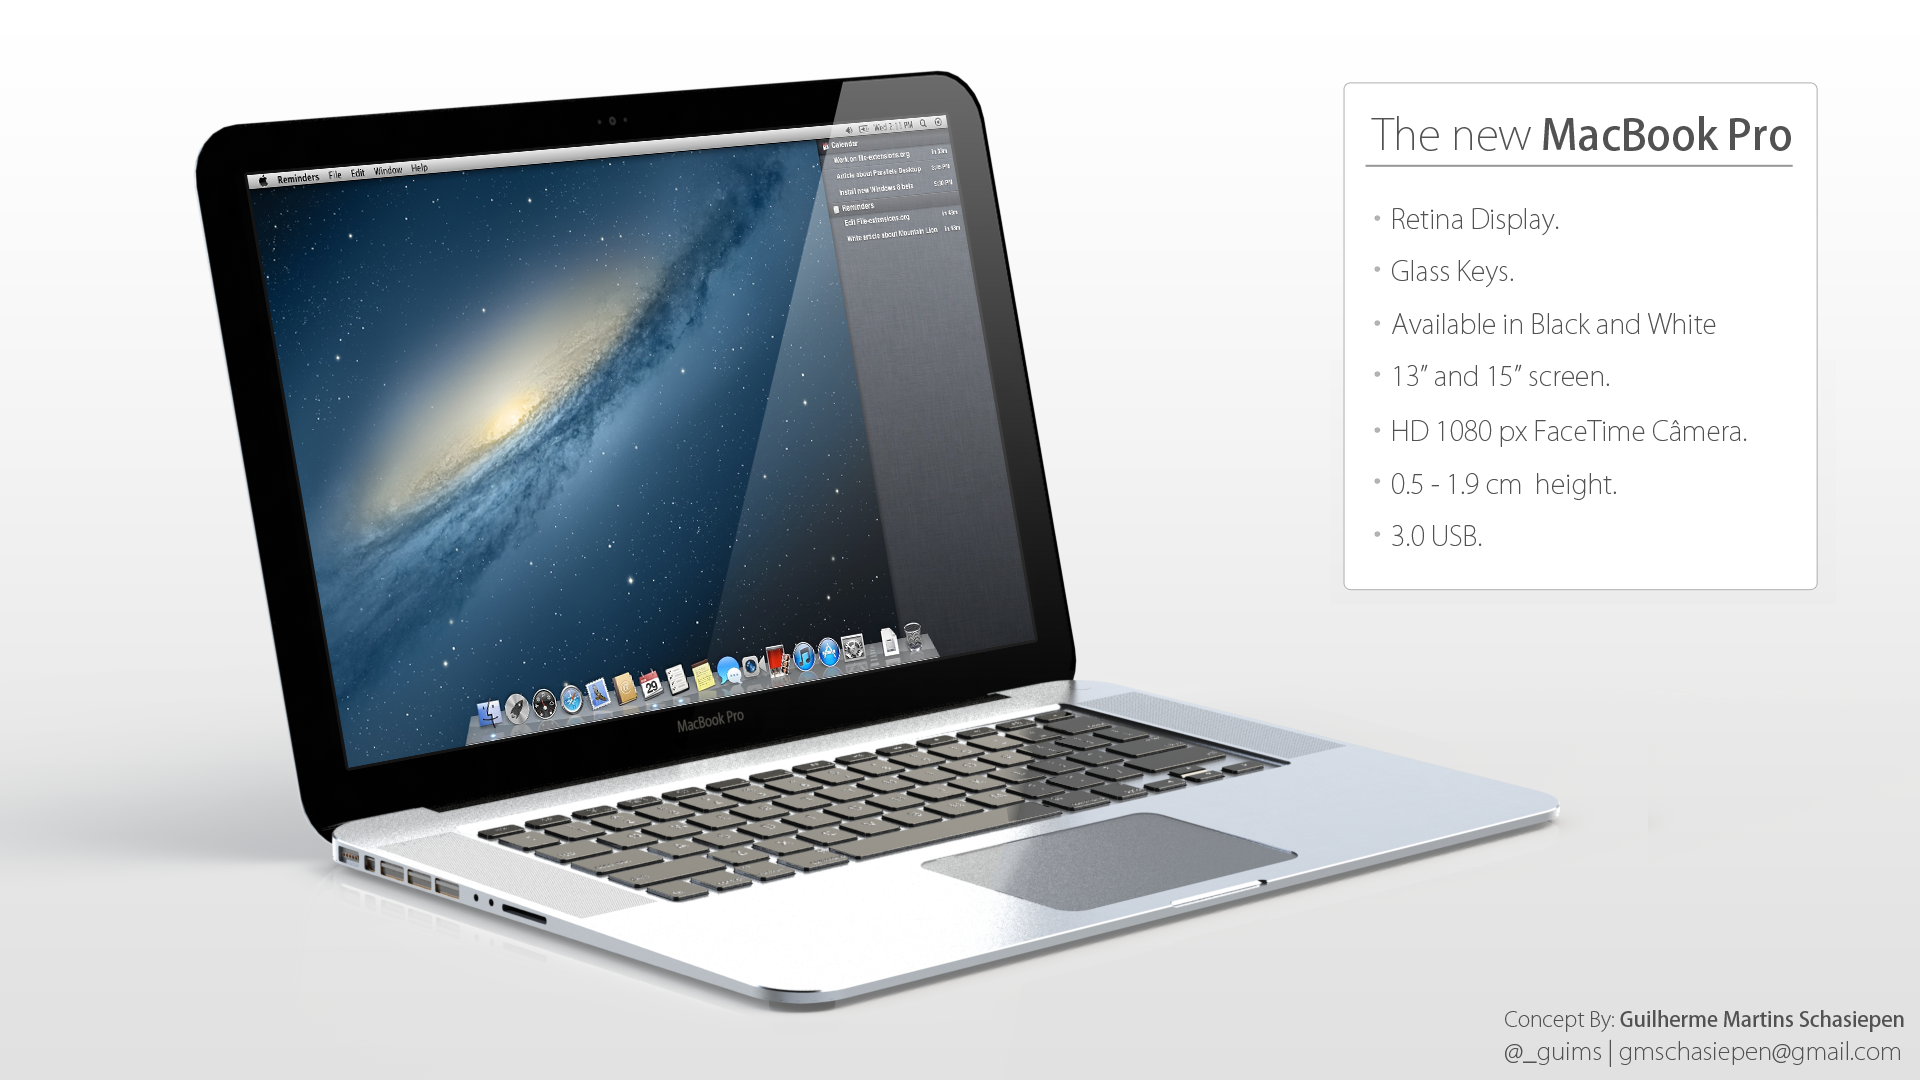 macbook, retina, display, wallpaper, design, conceptul